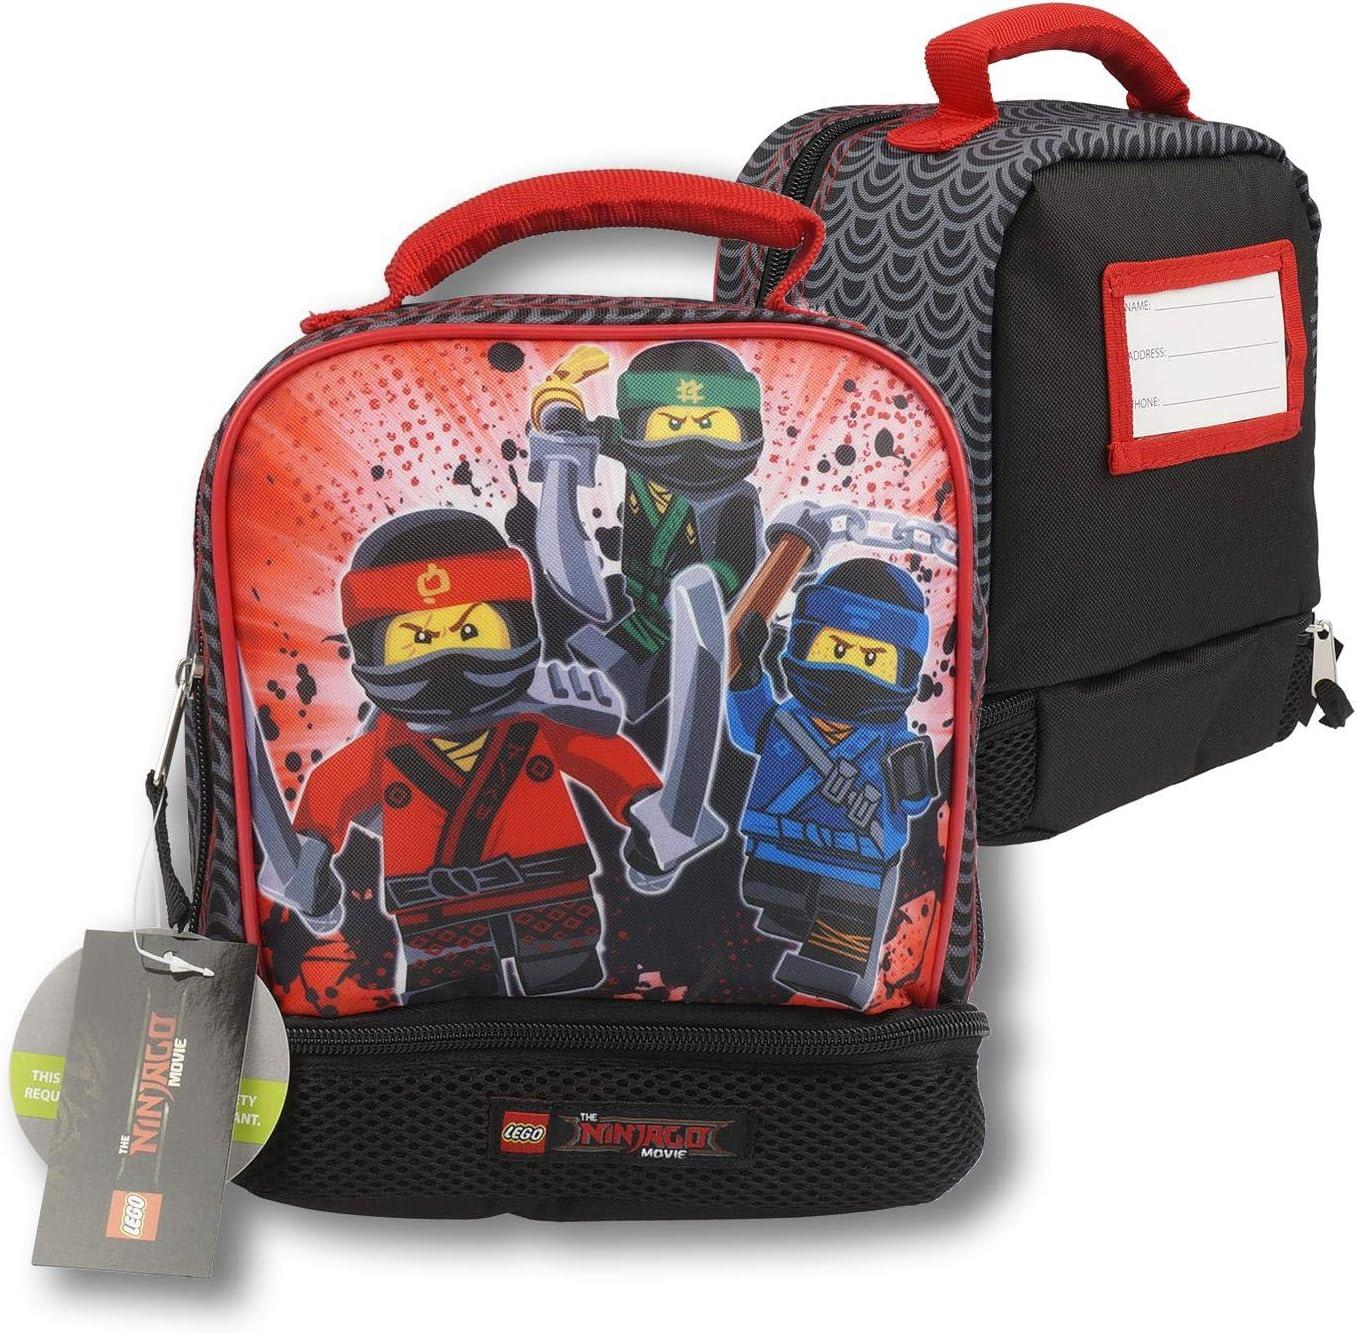 LEGO 34902 The Ninjago Movie Three Ninja Dual Compartment Lunch Bag, Multicolor